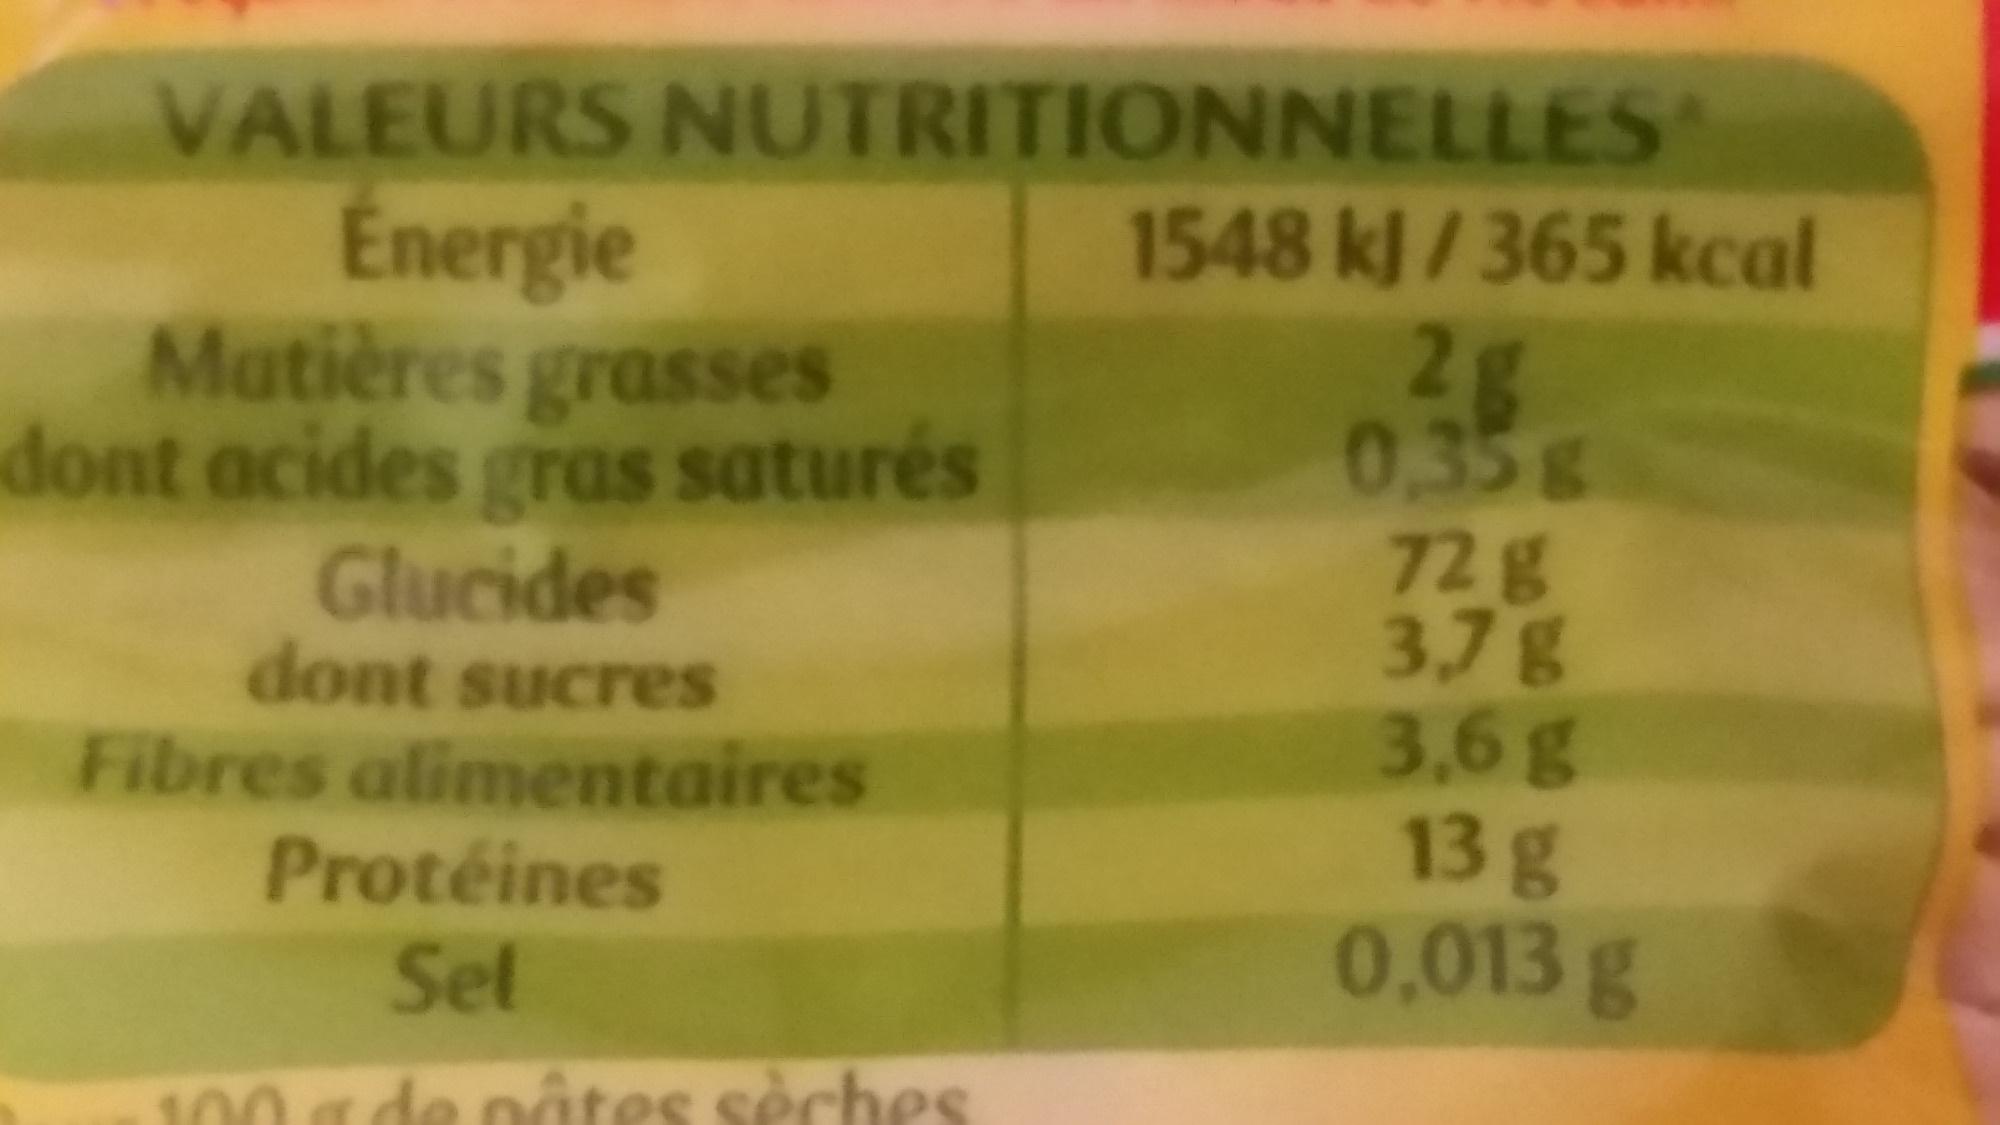 Panzani risetti - Nutrition facts - fr